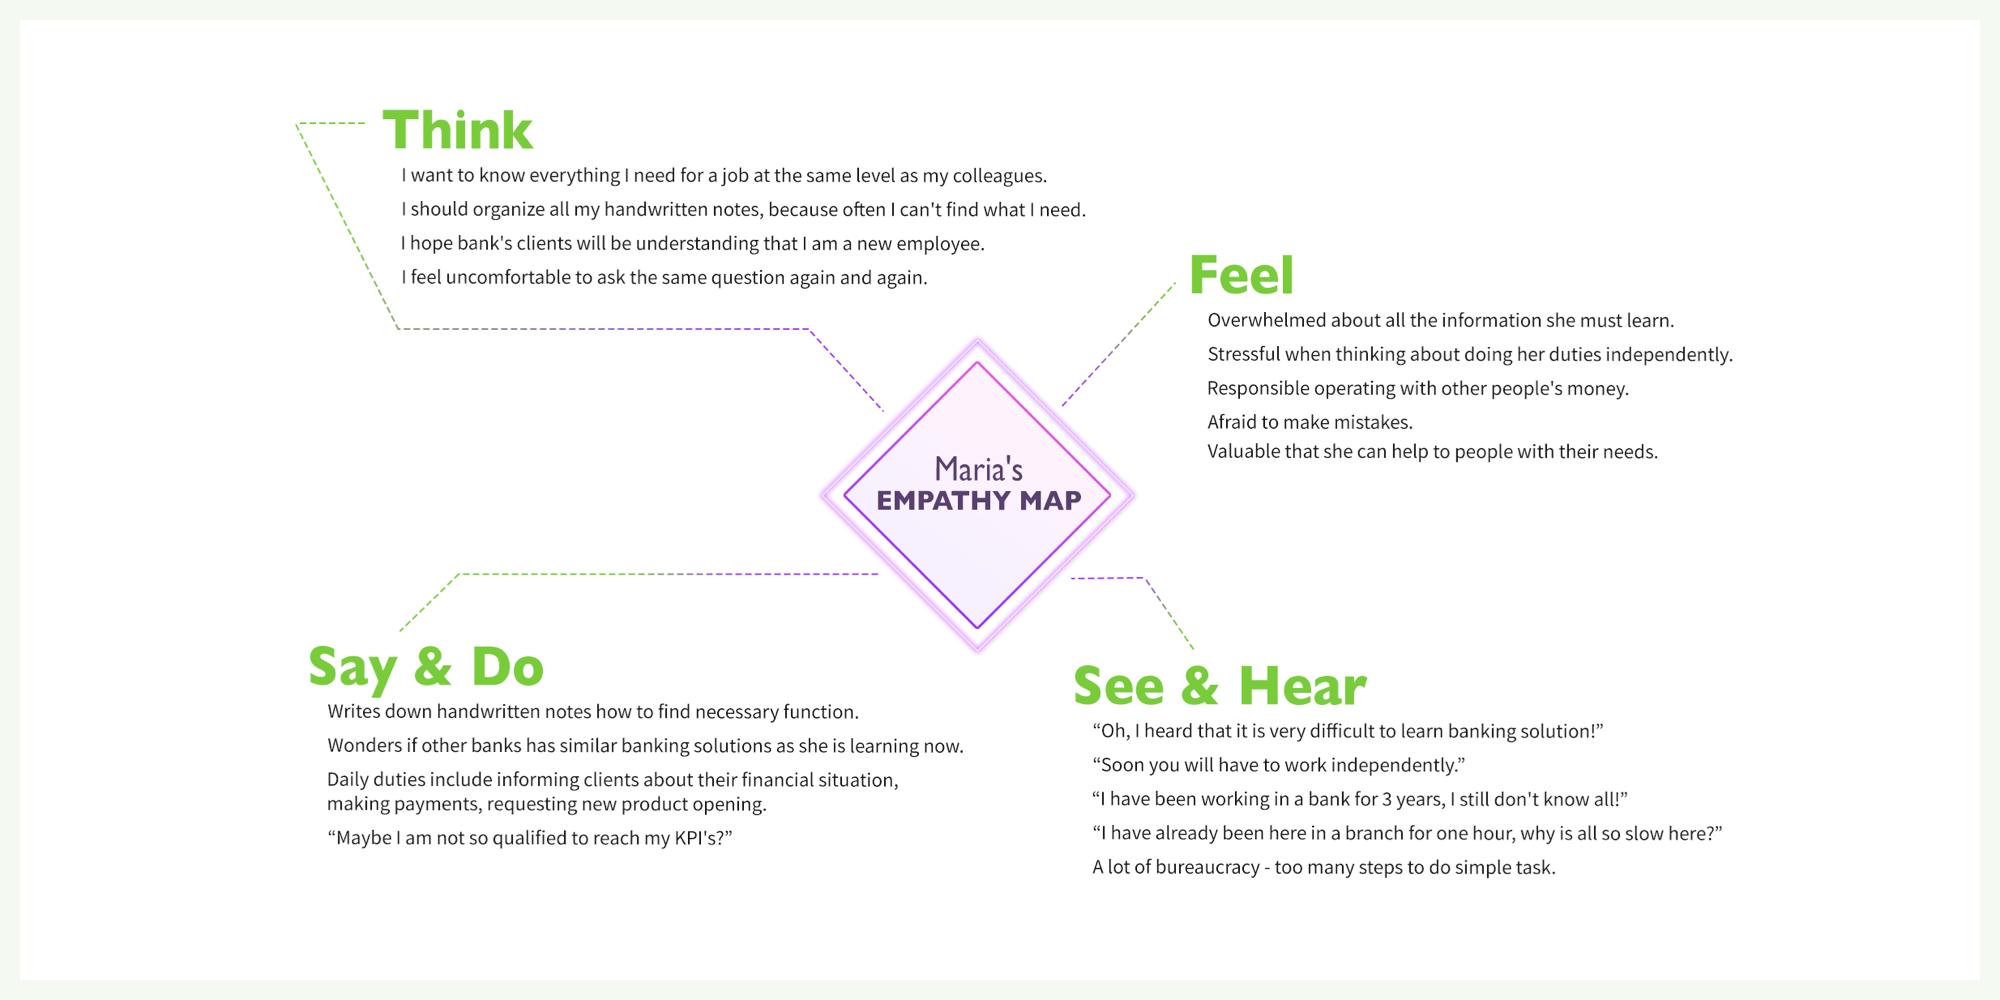 ux-design-core-banking-case-study-empathy-map